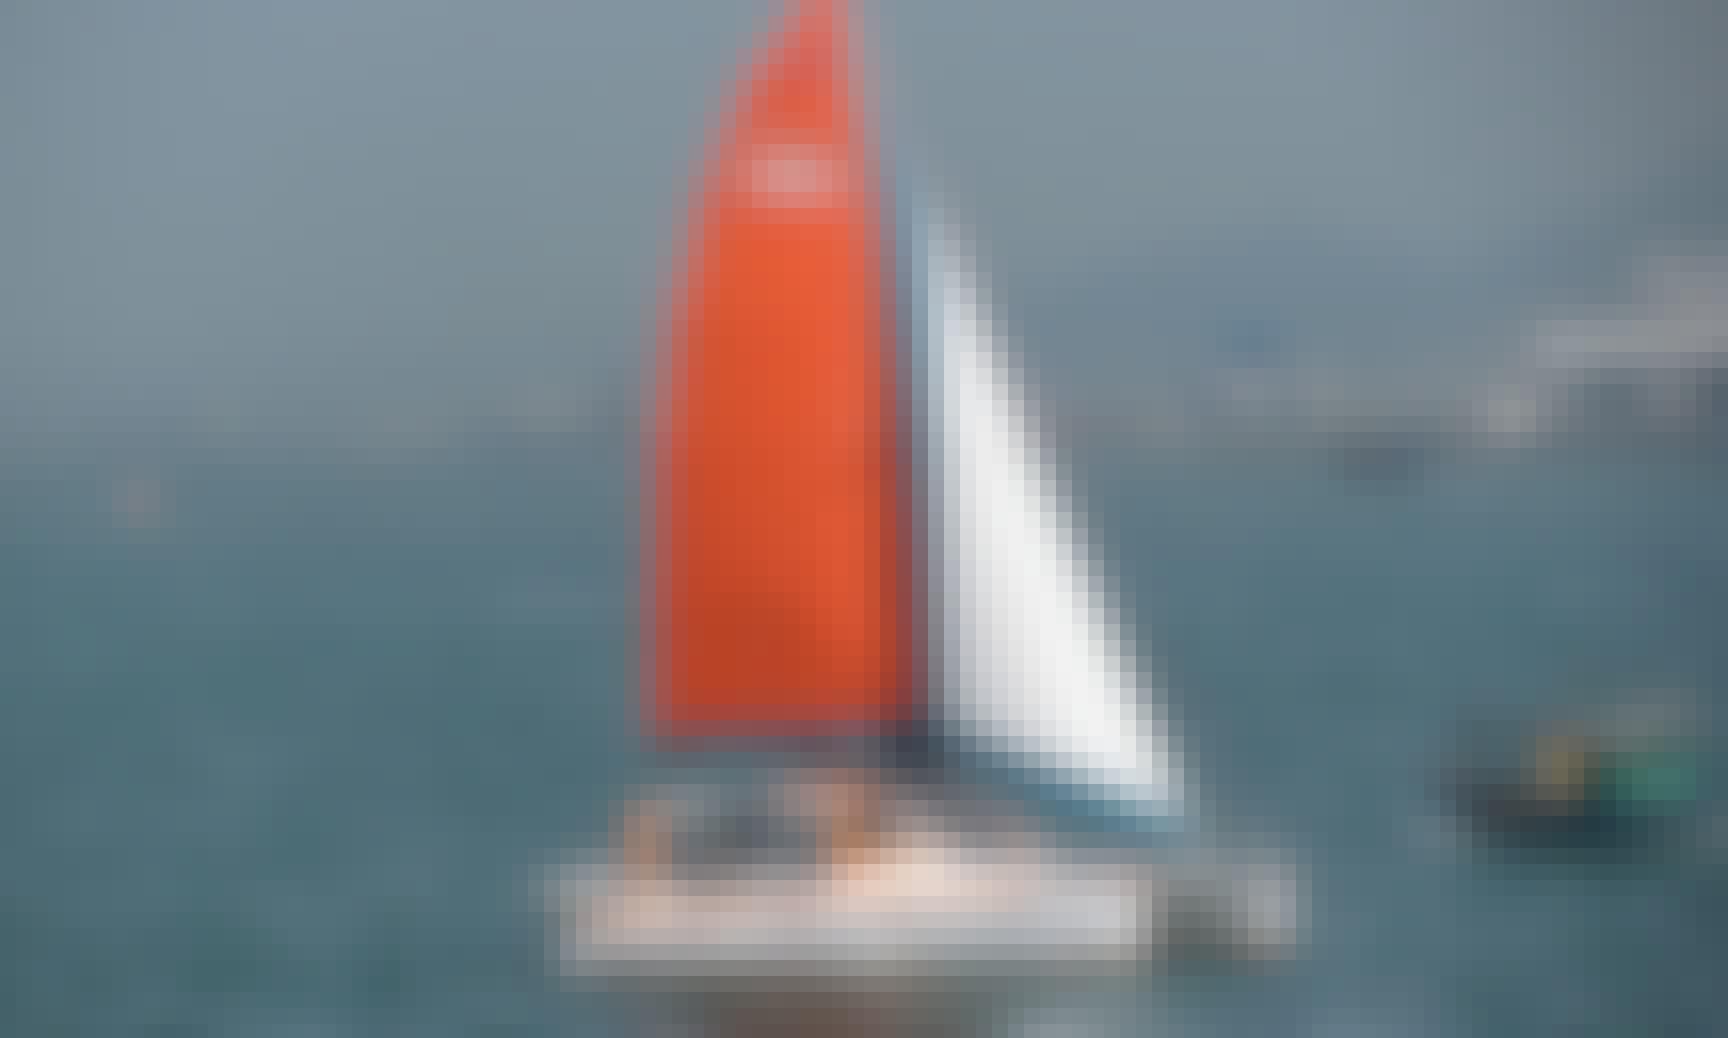 Scape 39 Sailing Catamaran Rental in Honolulu, Hawaii